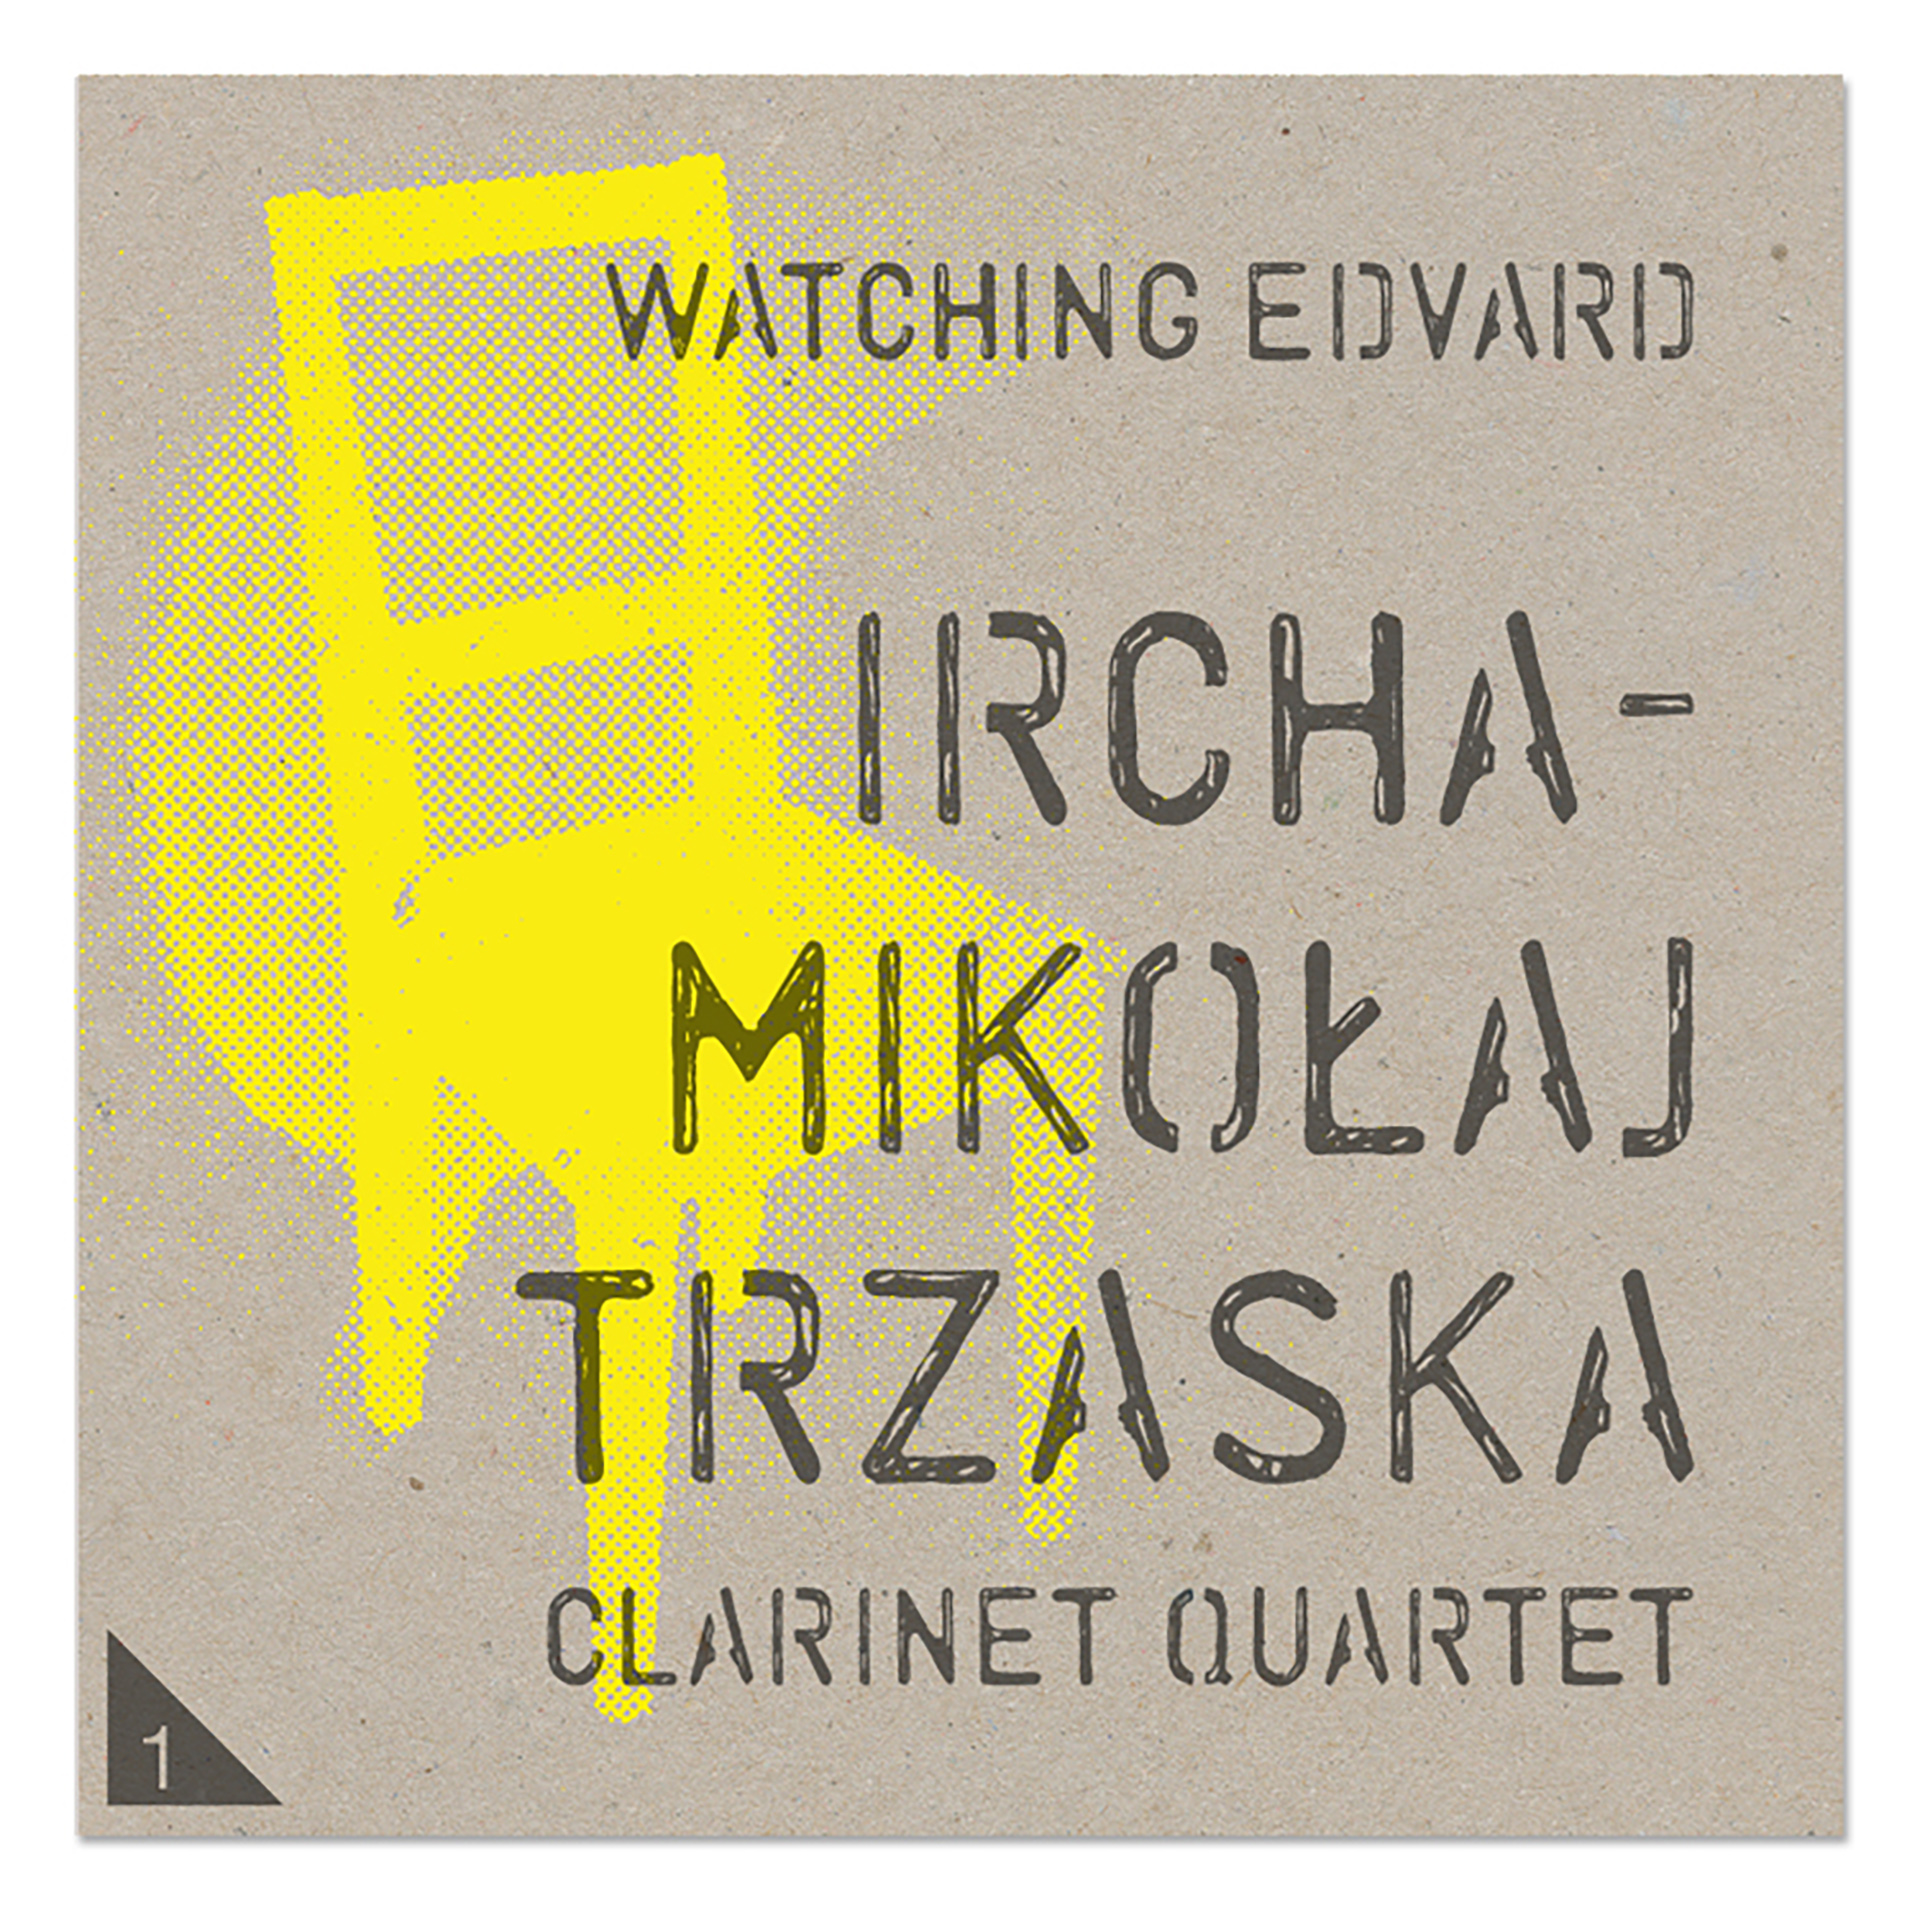 IRCHA – MIKOŁAJ TRZASKA CLARINET QUARTET – WATCHING EDVARD